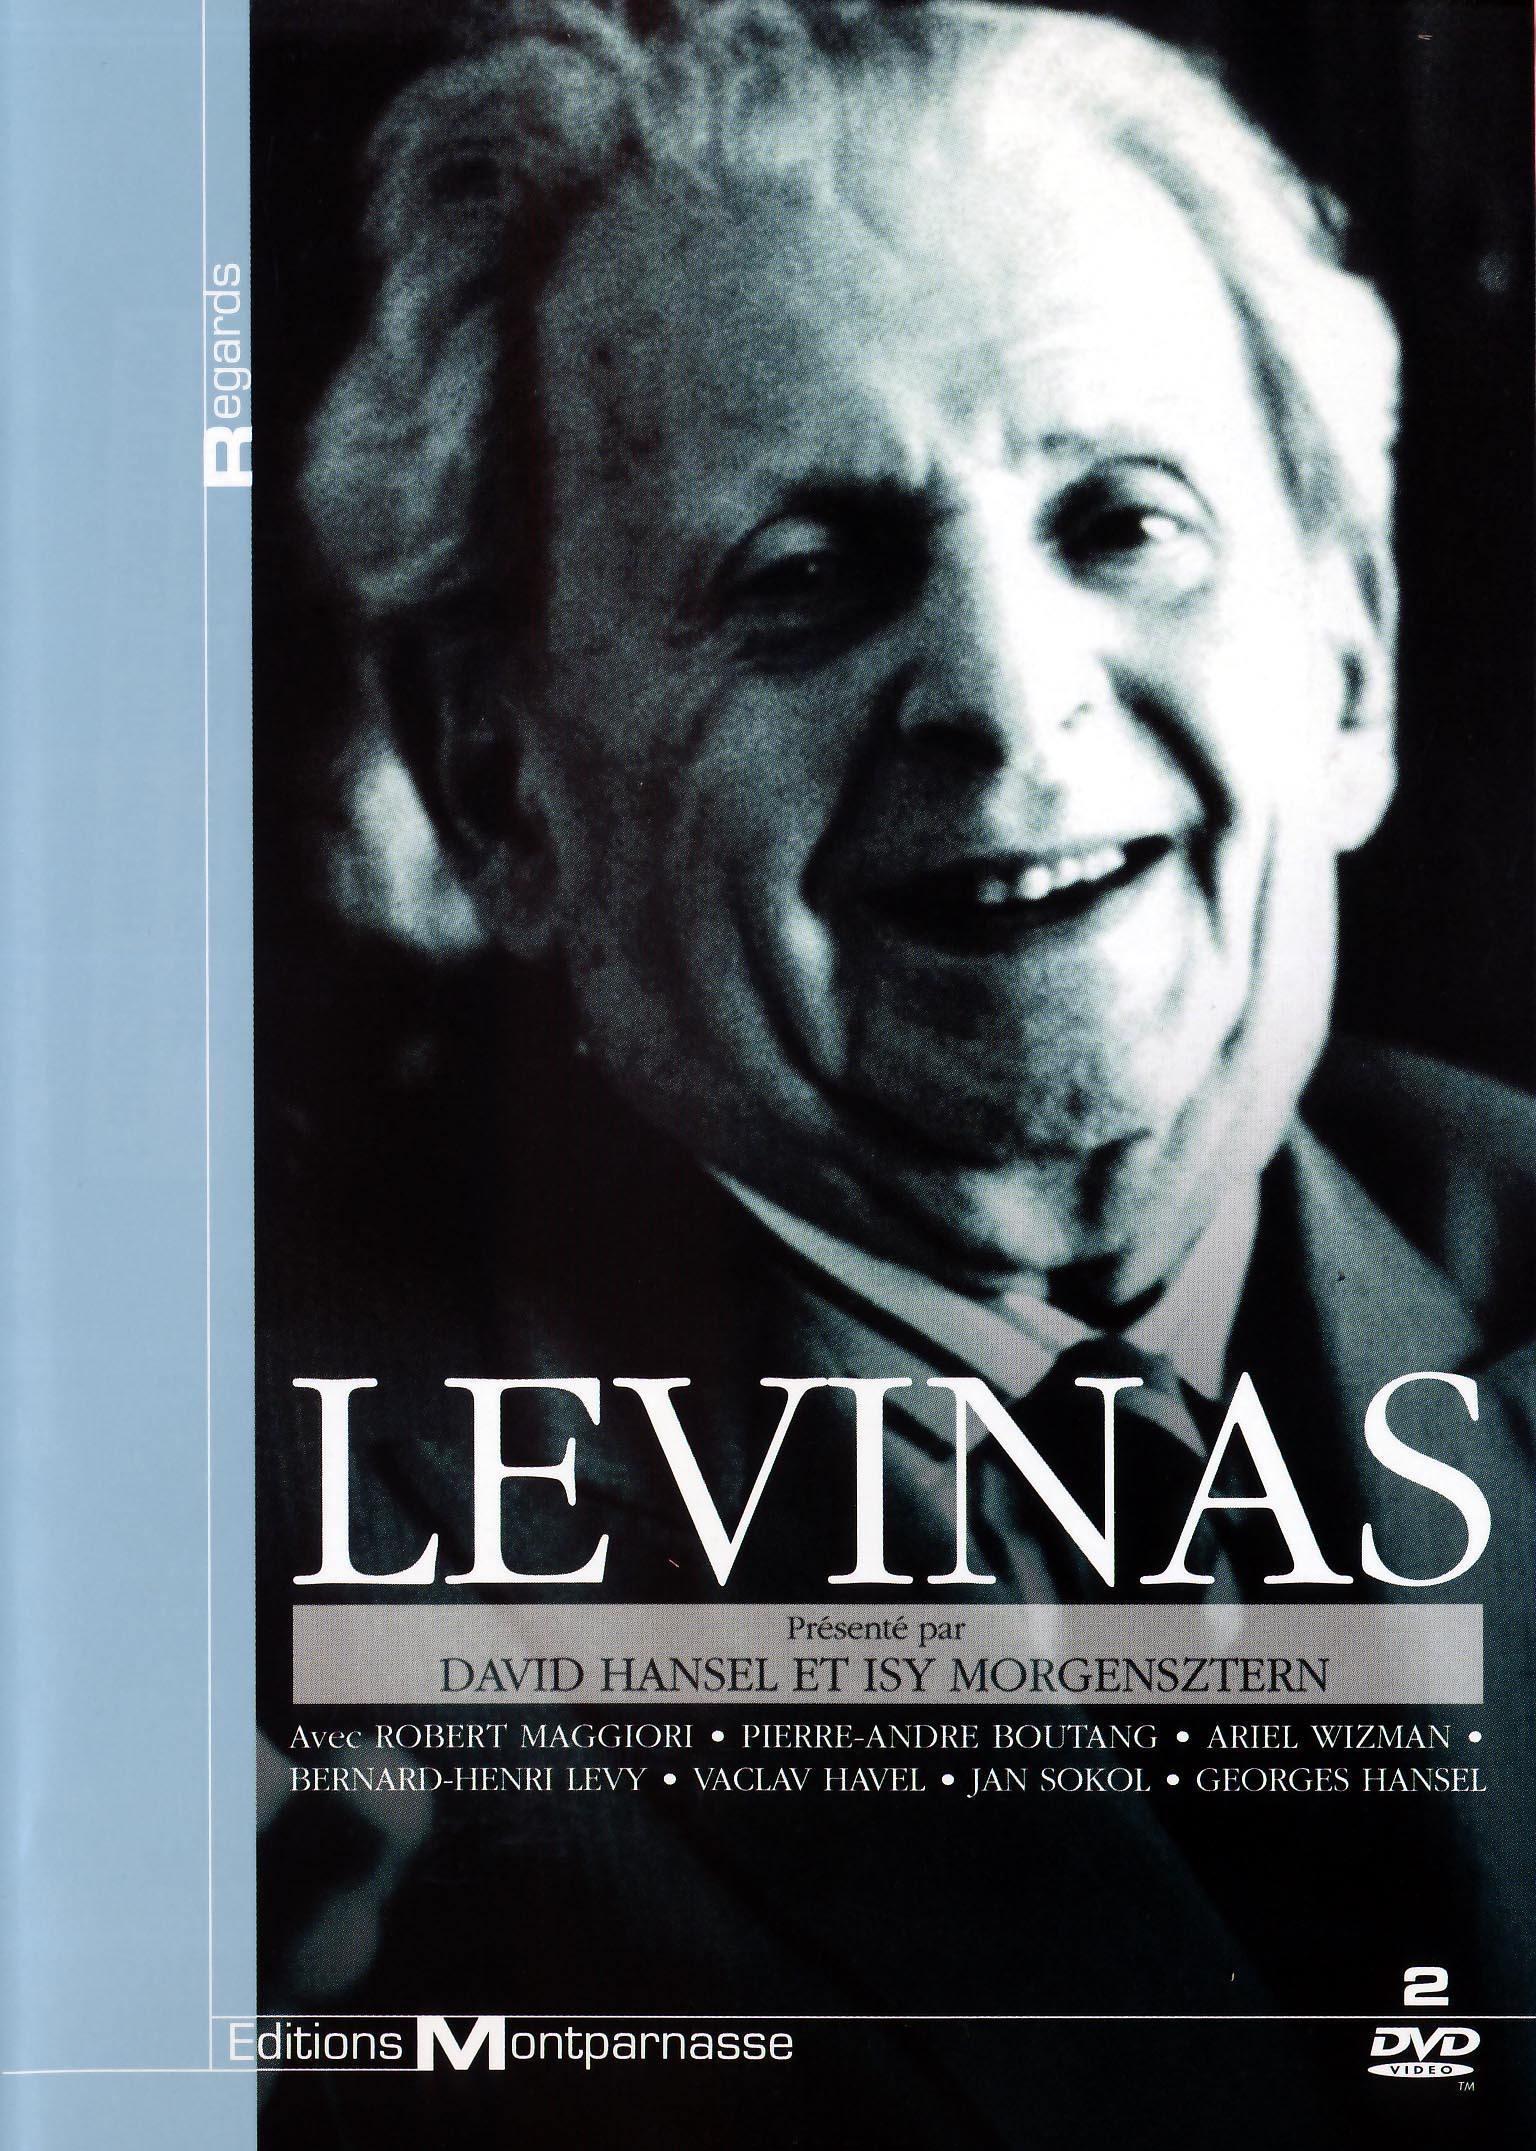 Regards - levinas - 2 dvd